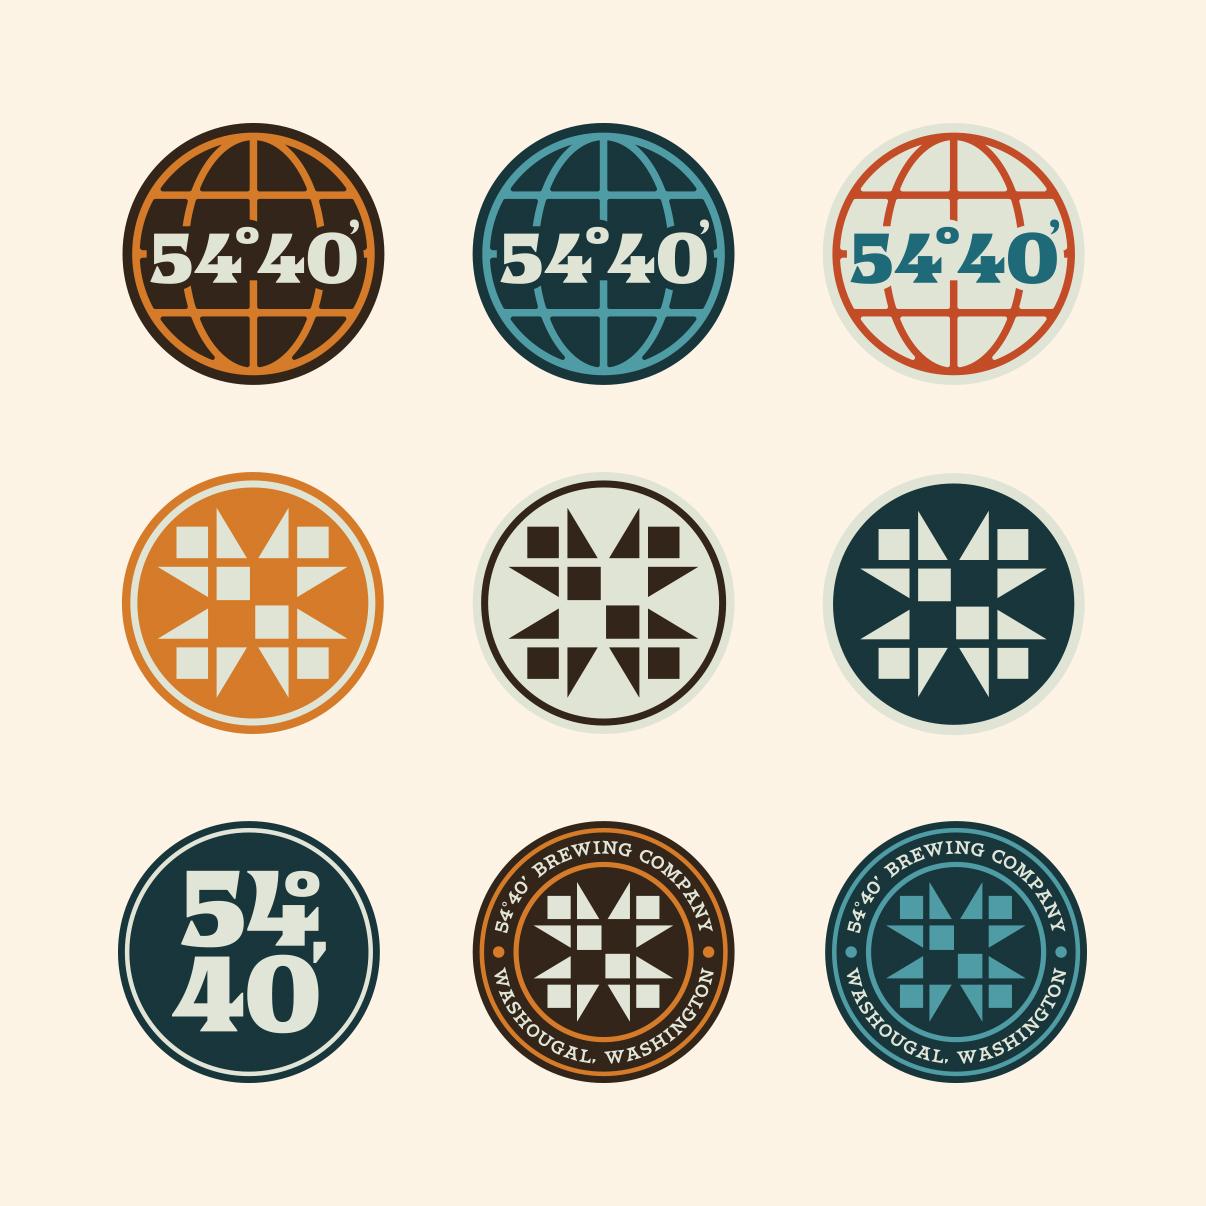 5440_stickers.jpg